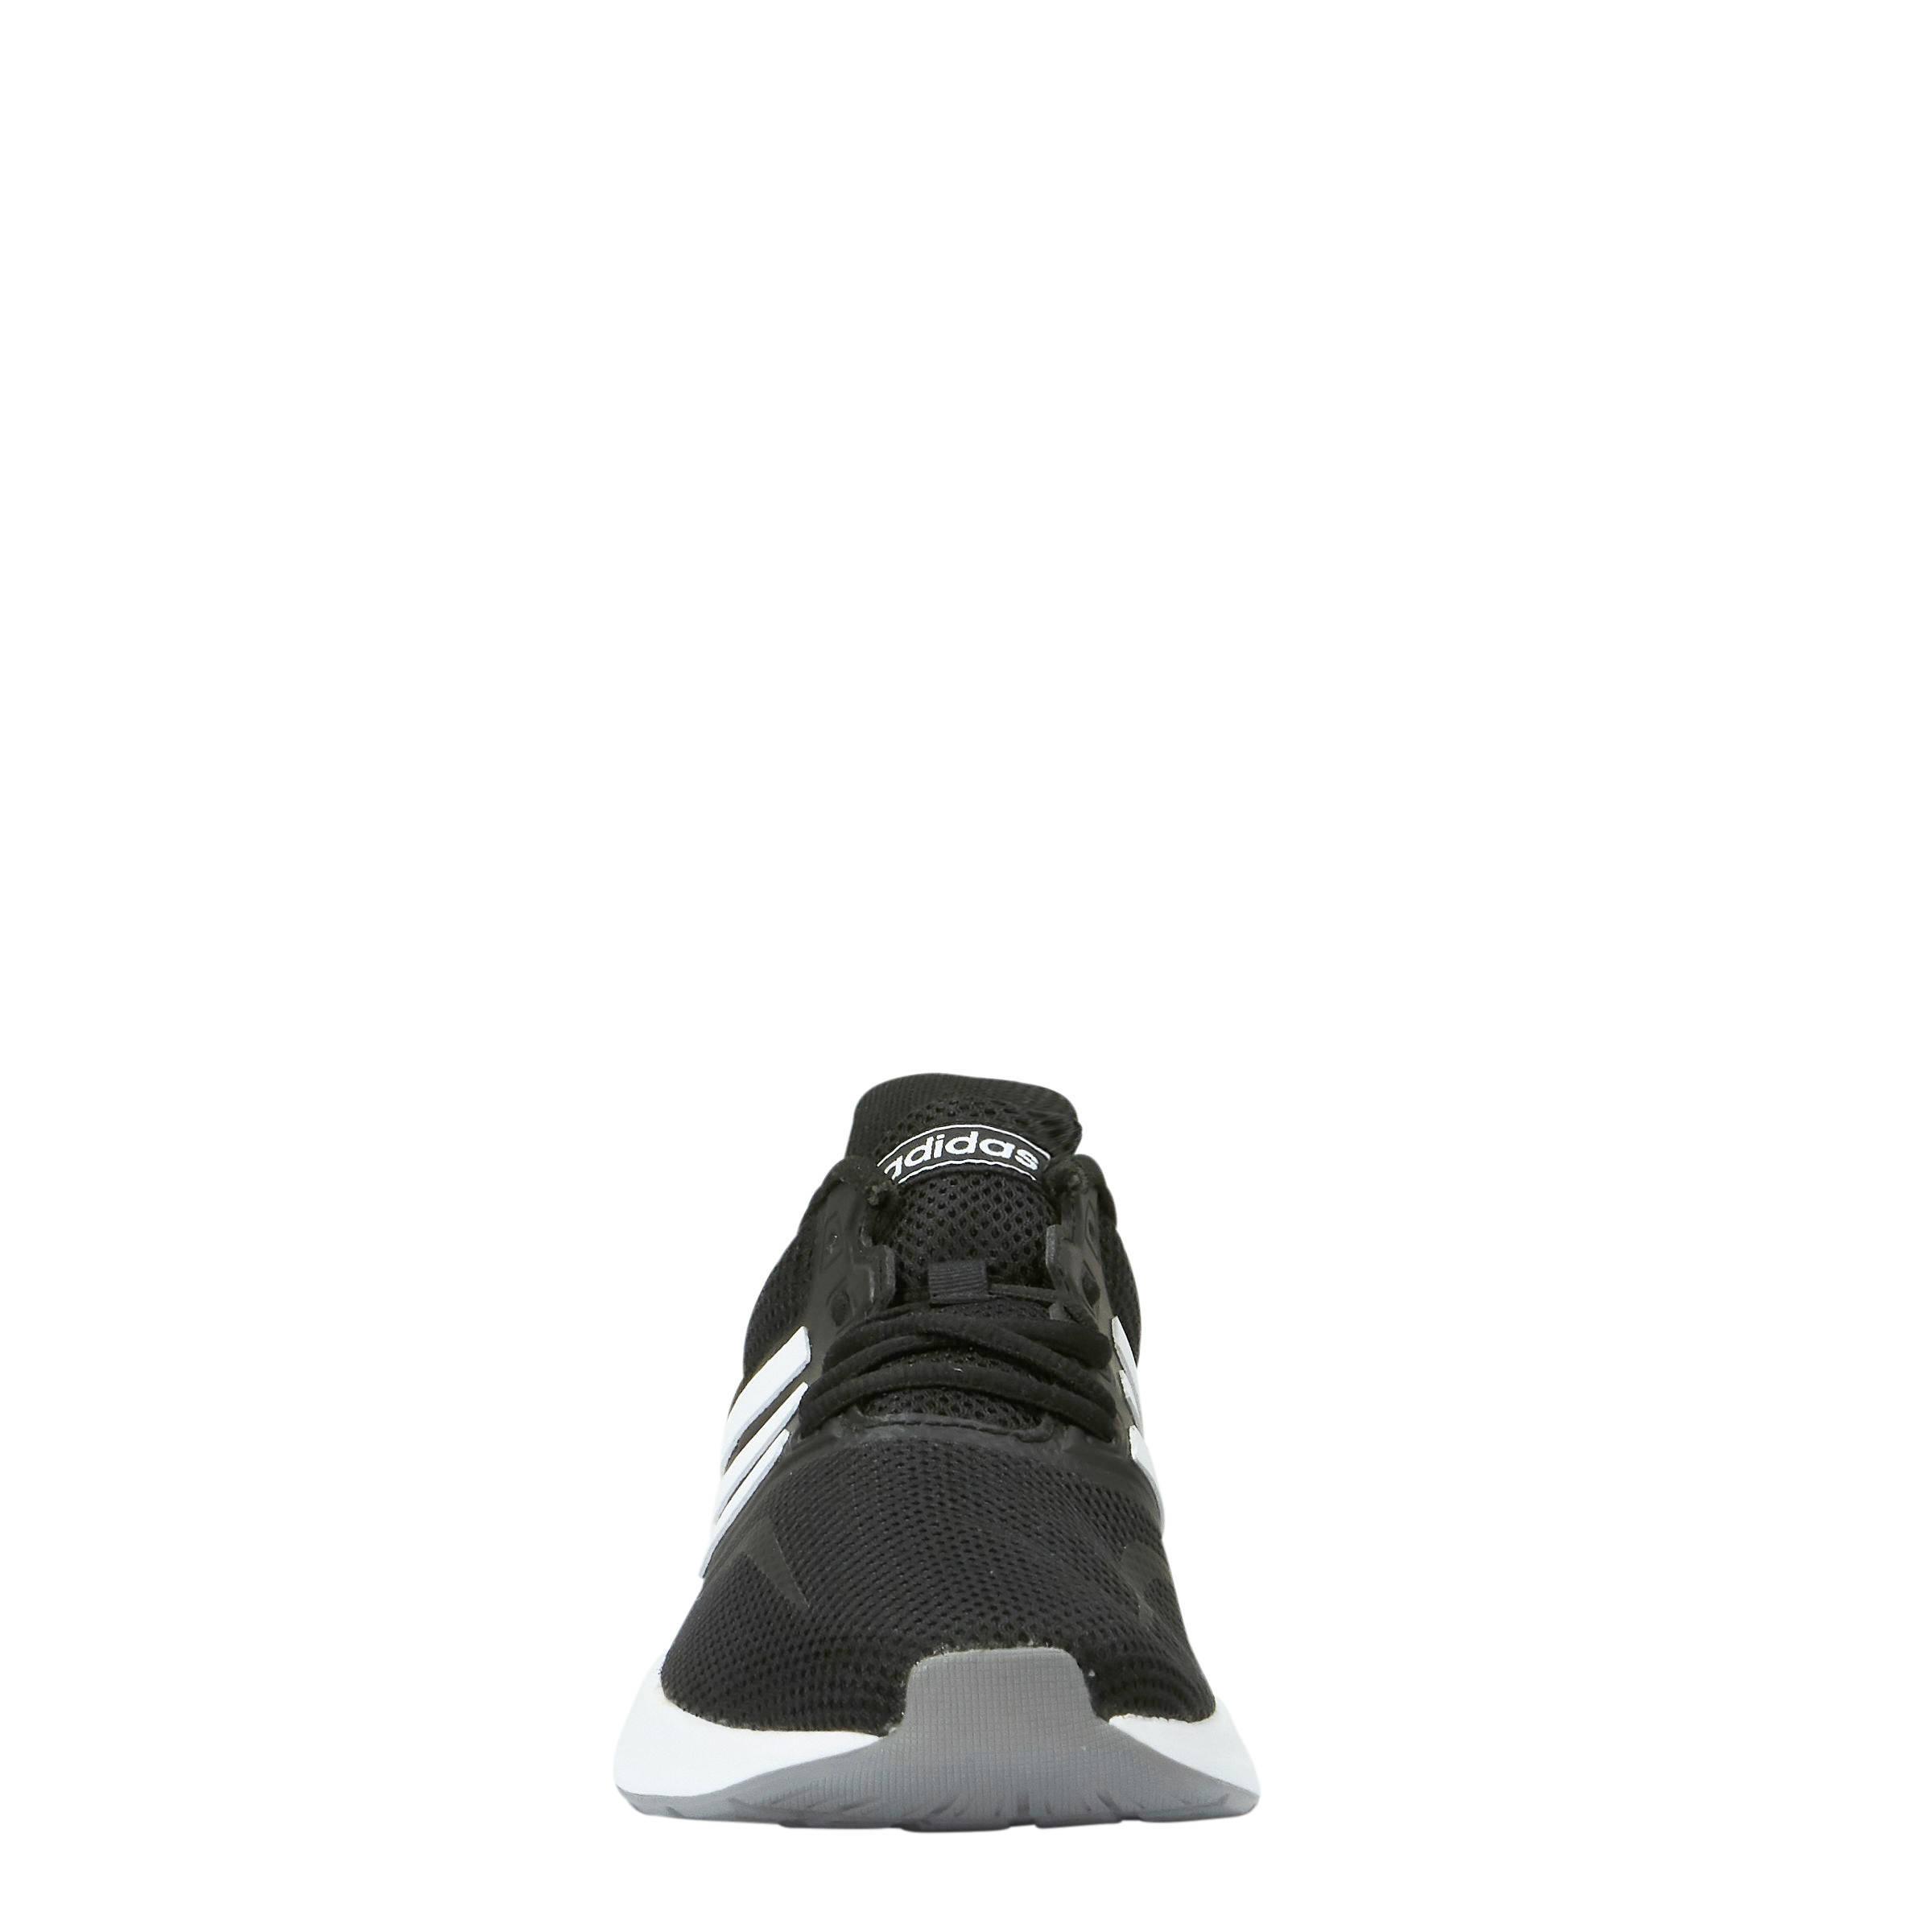 adidas Performance Runfalcon hardloopschoenen zwart/wit ...